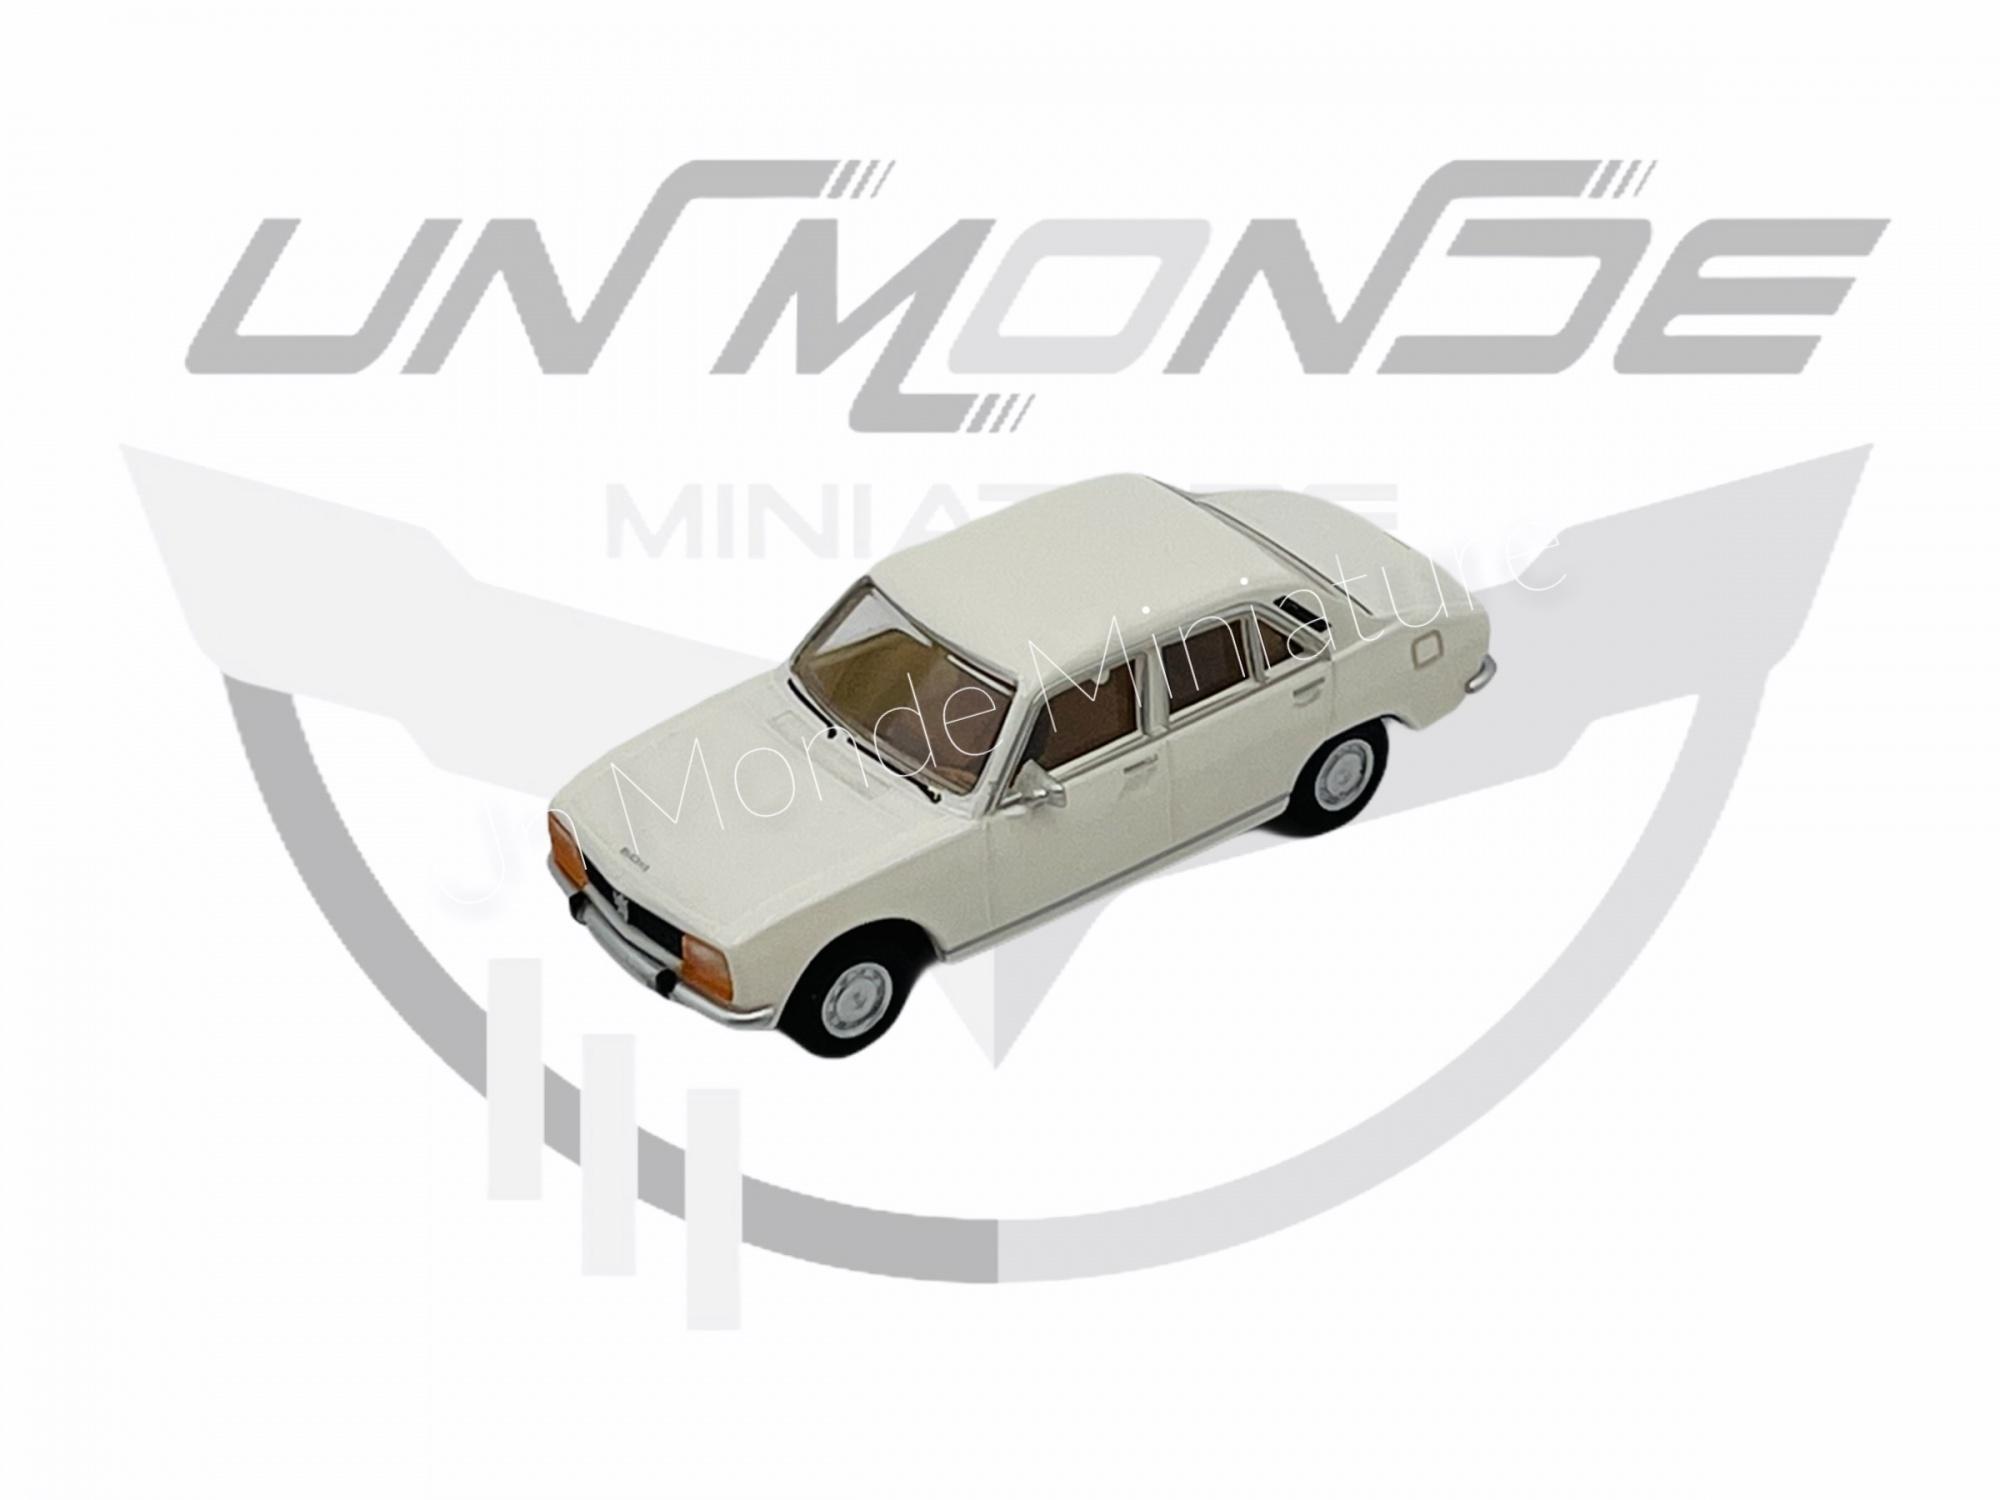 Peugeot 504 Blanche